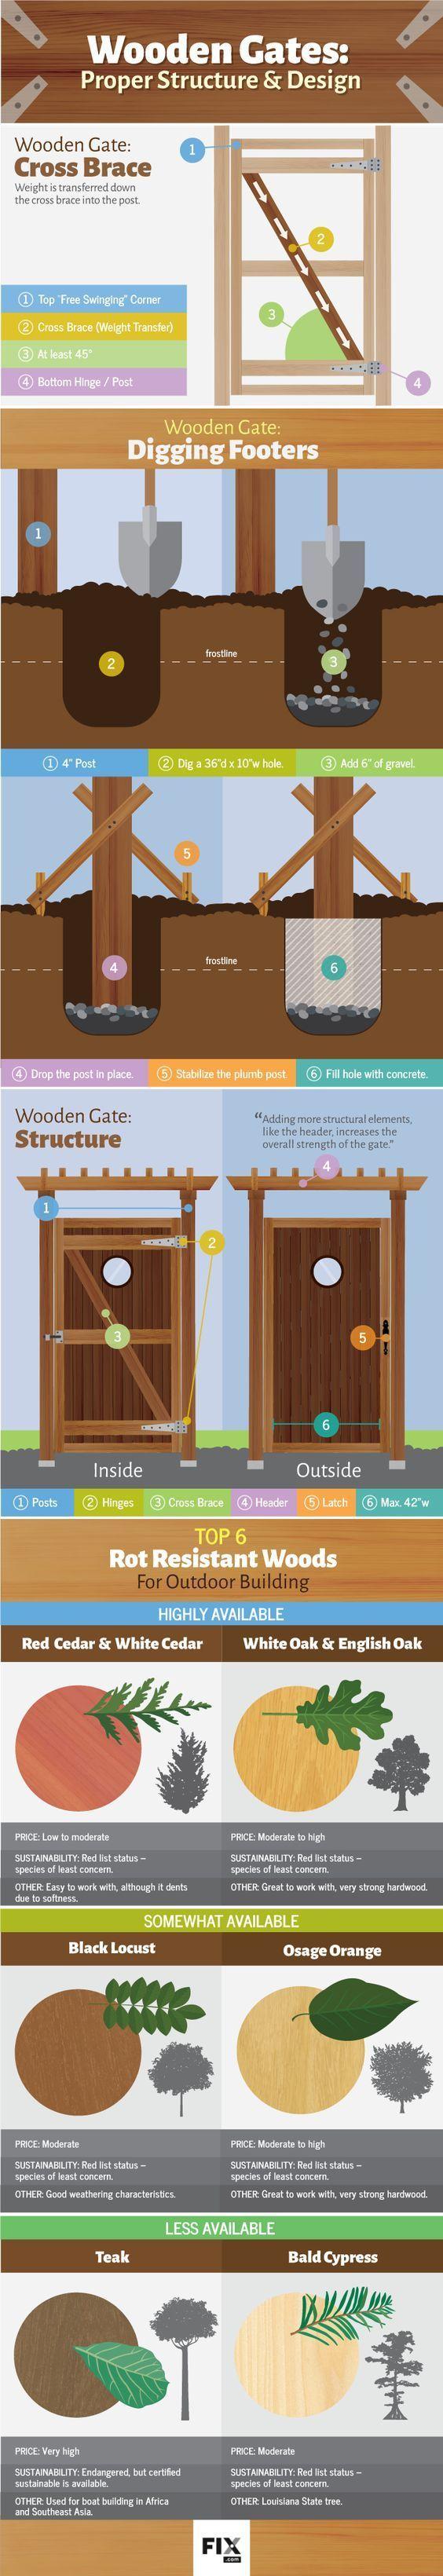 Wooden Gate Structure and Design Infographic   DIY Preparedness